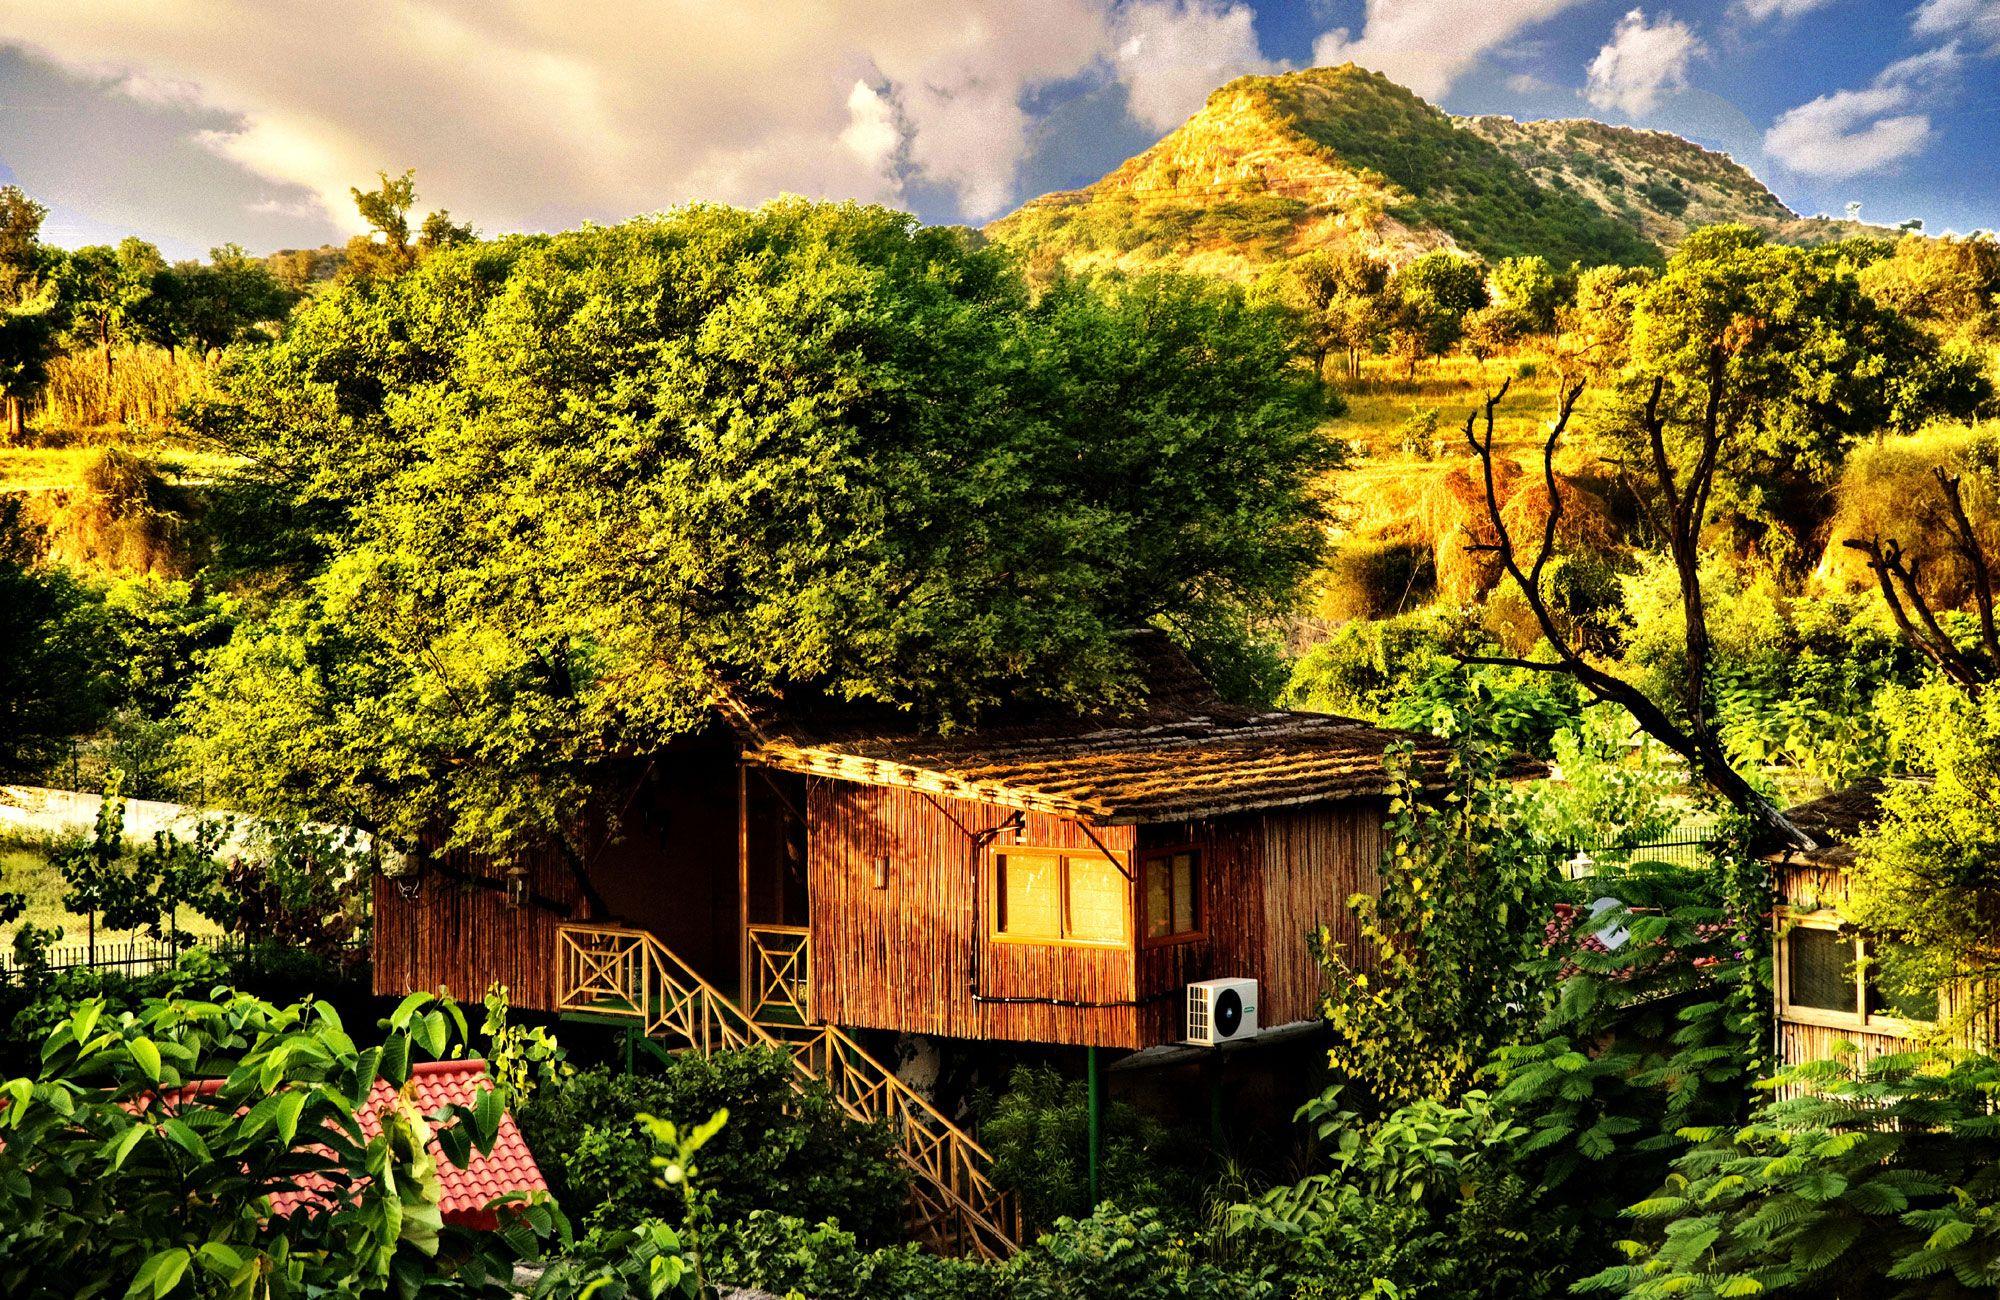 The Treehouse Resort Jaipur, India